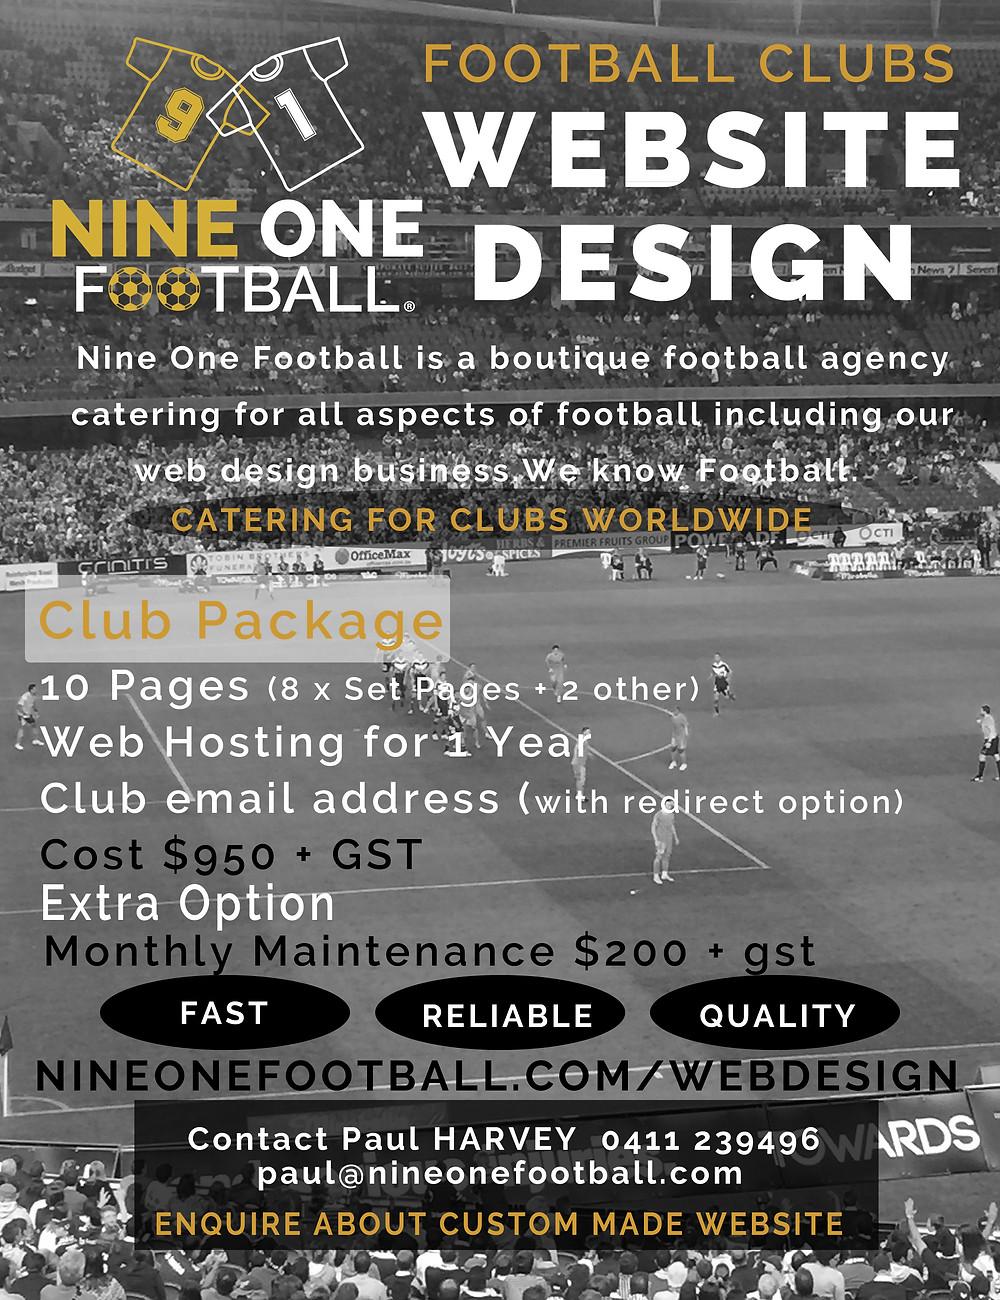 Nine One Football Website Design